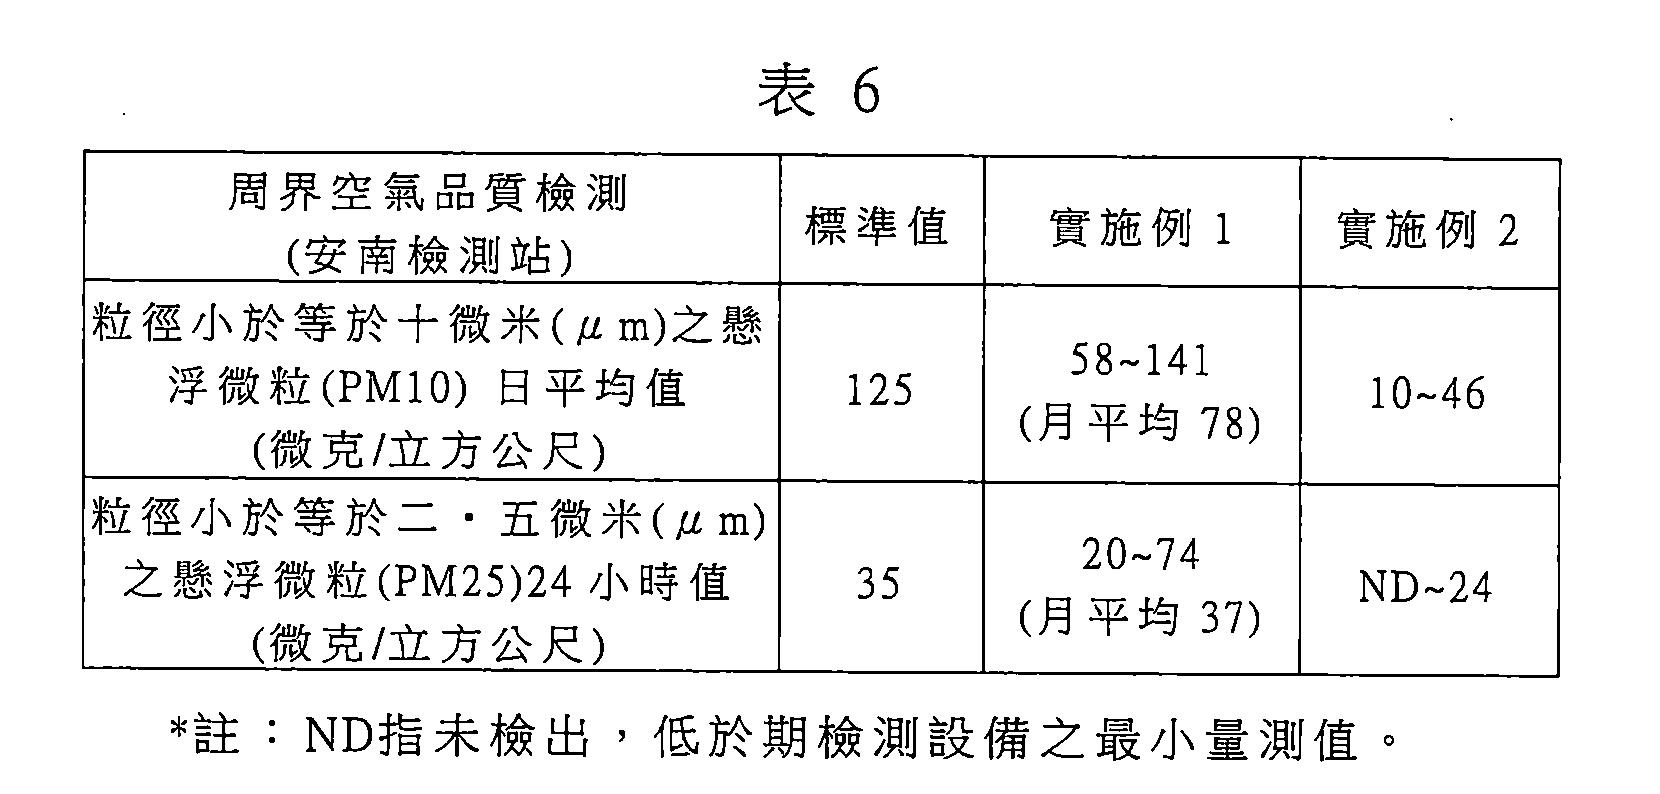 Figure 106130287-A0101-12-0014-7